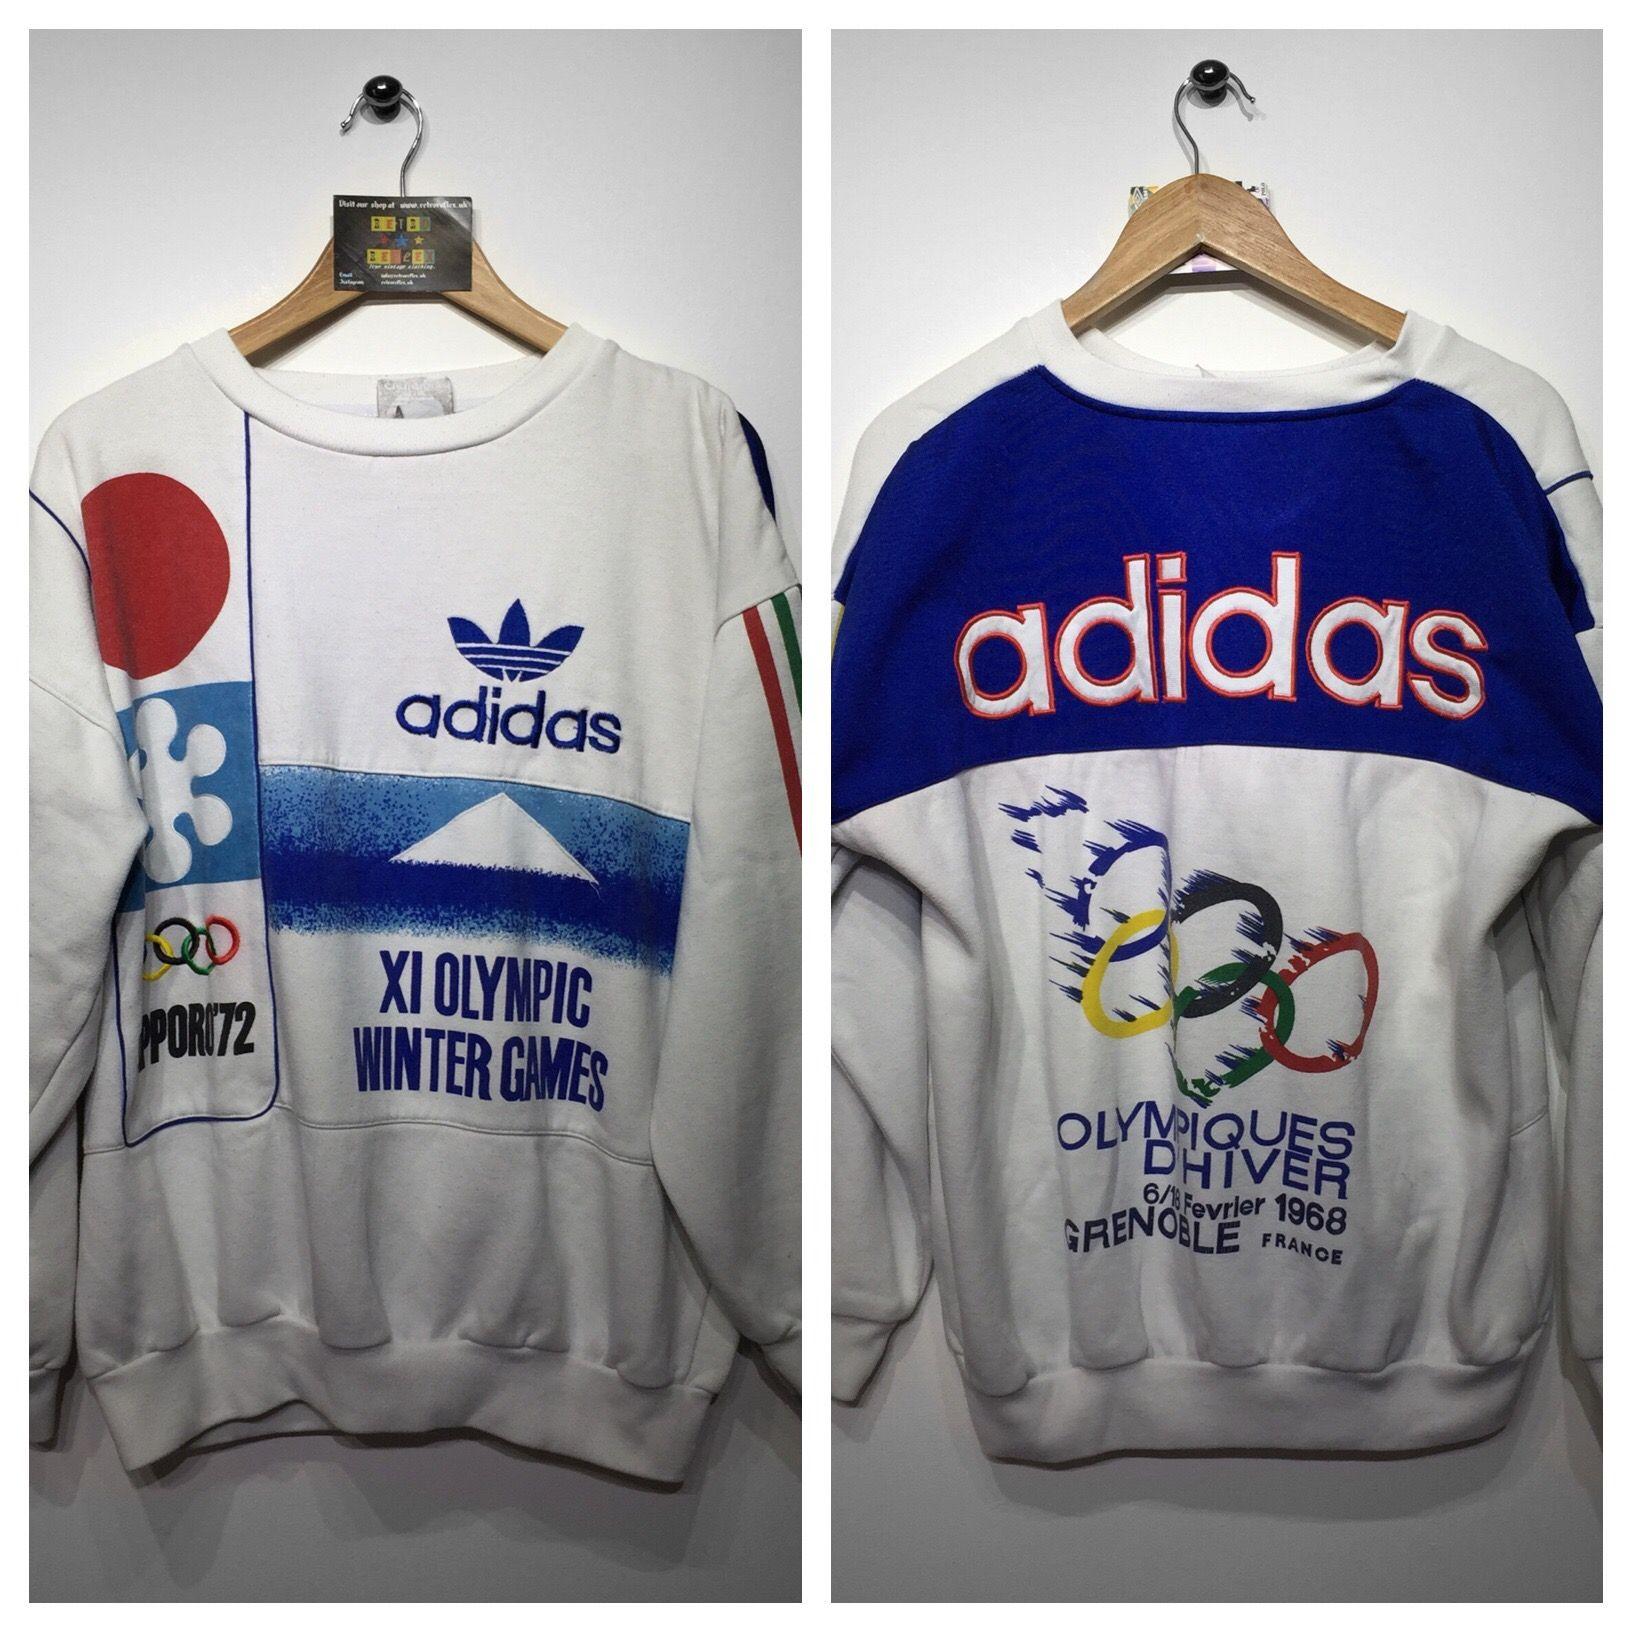 Rare Adidas Winter Olympic Games Sweatshirt Size Medium But Fits Oversized 120 Website Www Retroreflex Uk Adida Vintage Outfits Clothes Long Sweatshirt [ 1632 x 1632 Pixel ]